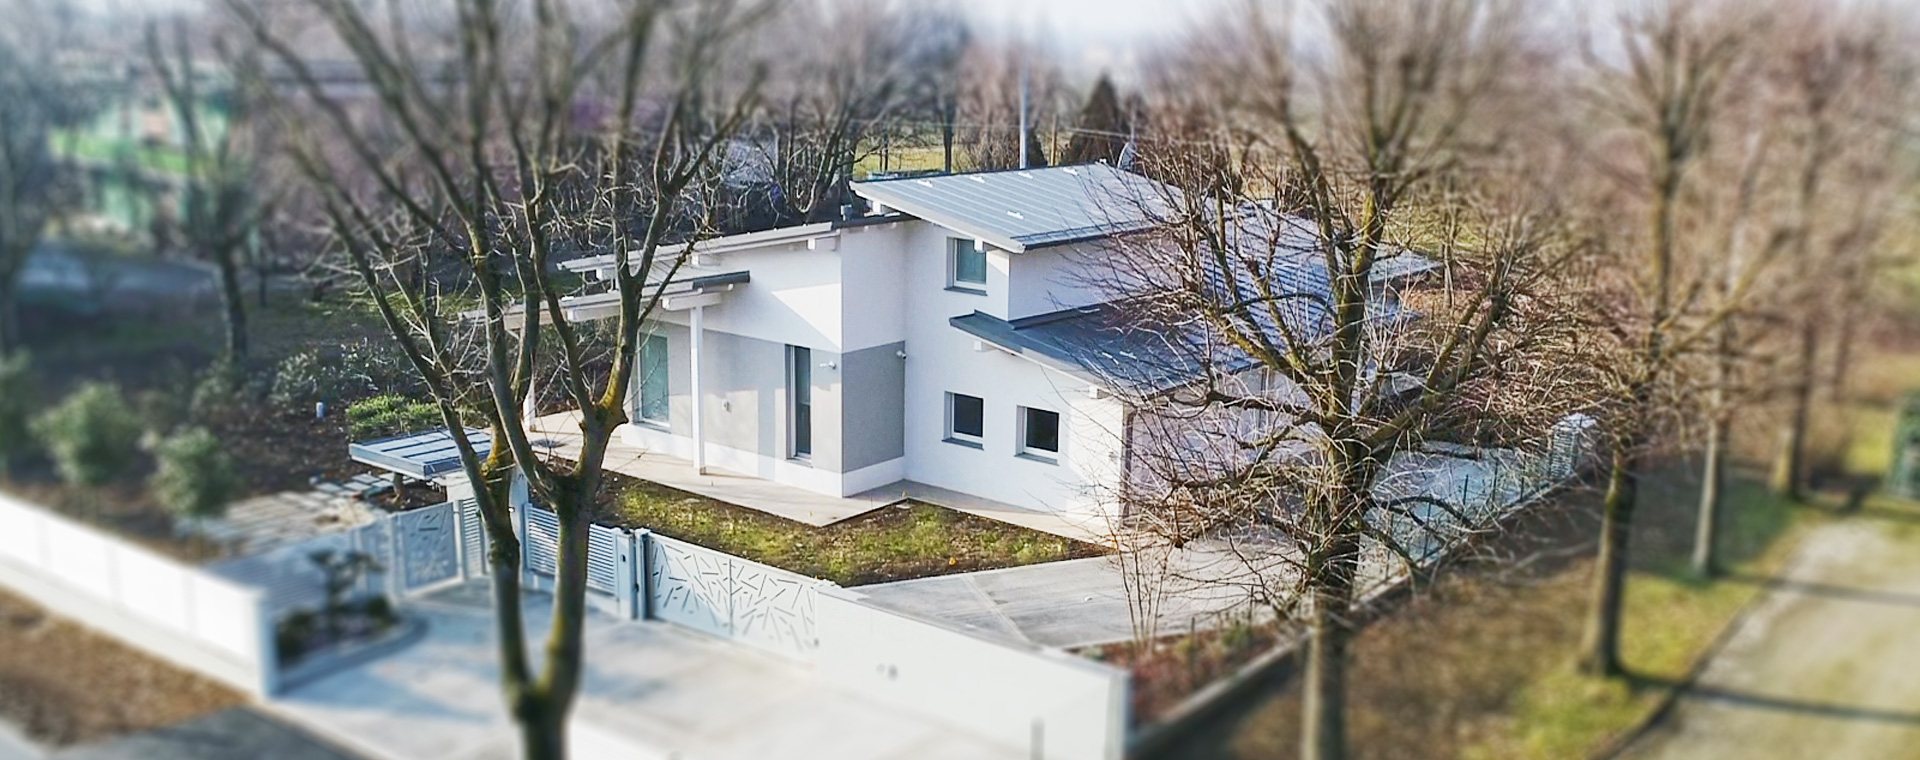 <span>La casa italiana in legno</span><span>The Italian wooden house</span>